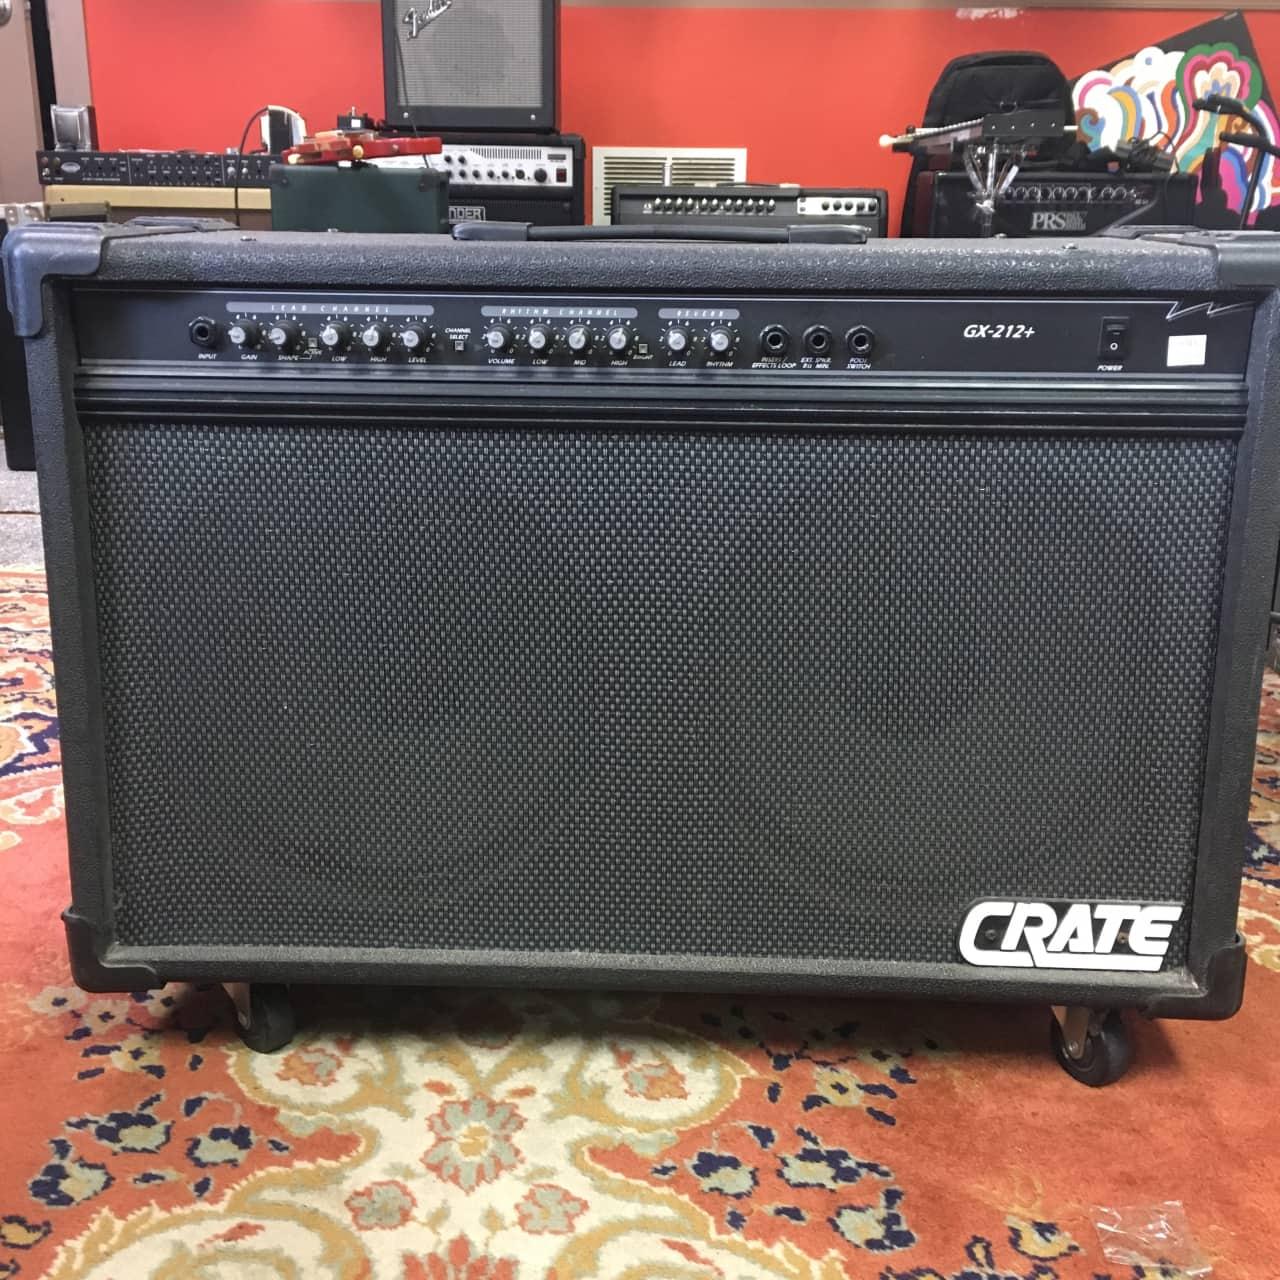 Progressive Insurance Payment >> Crate GX-212+ Guitar Amp | Reverb